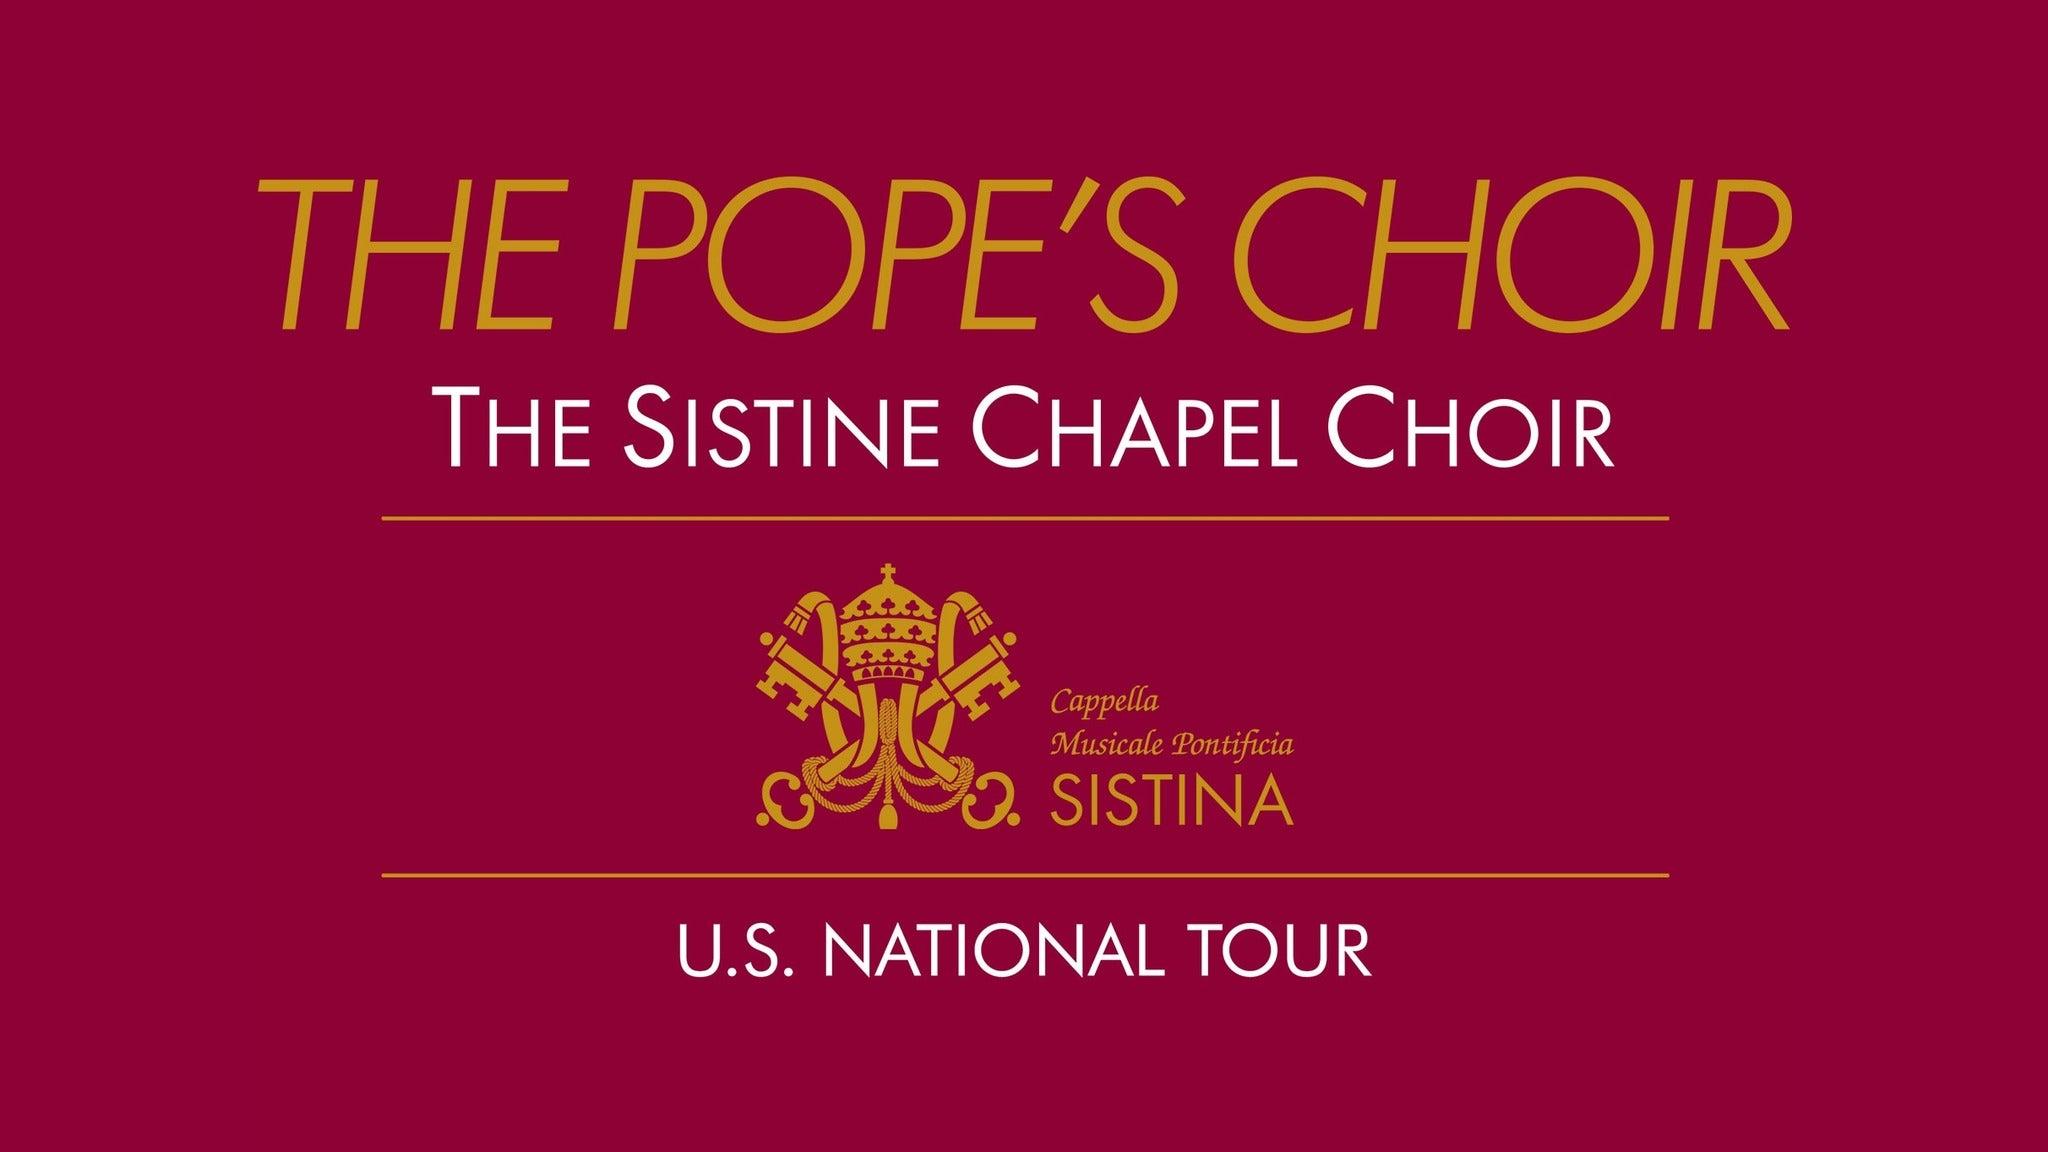 The Sistine Chapel Choir - (The Pope's Choir)